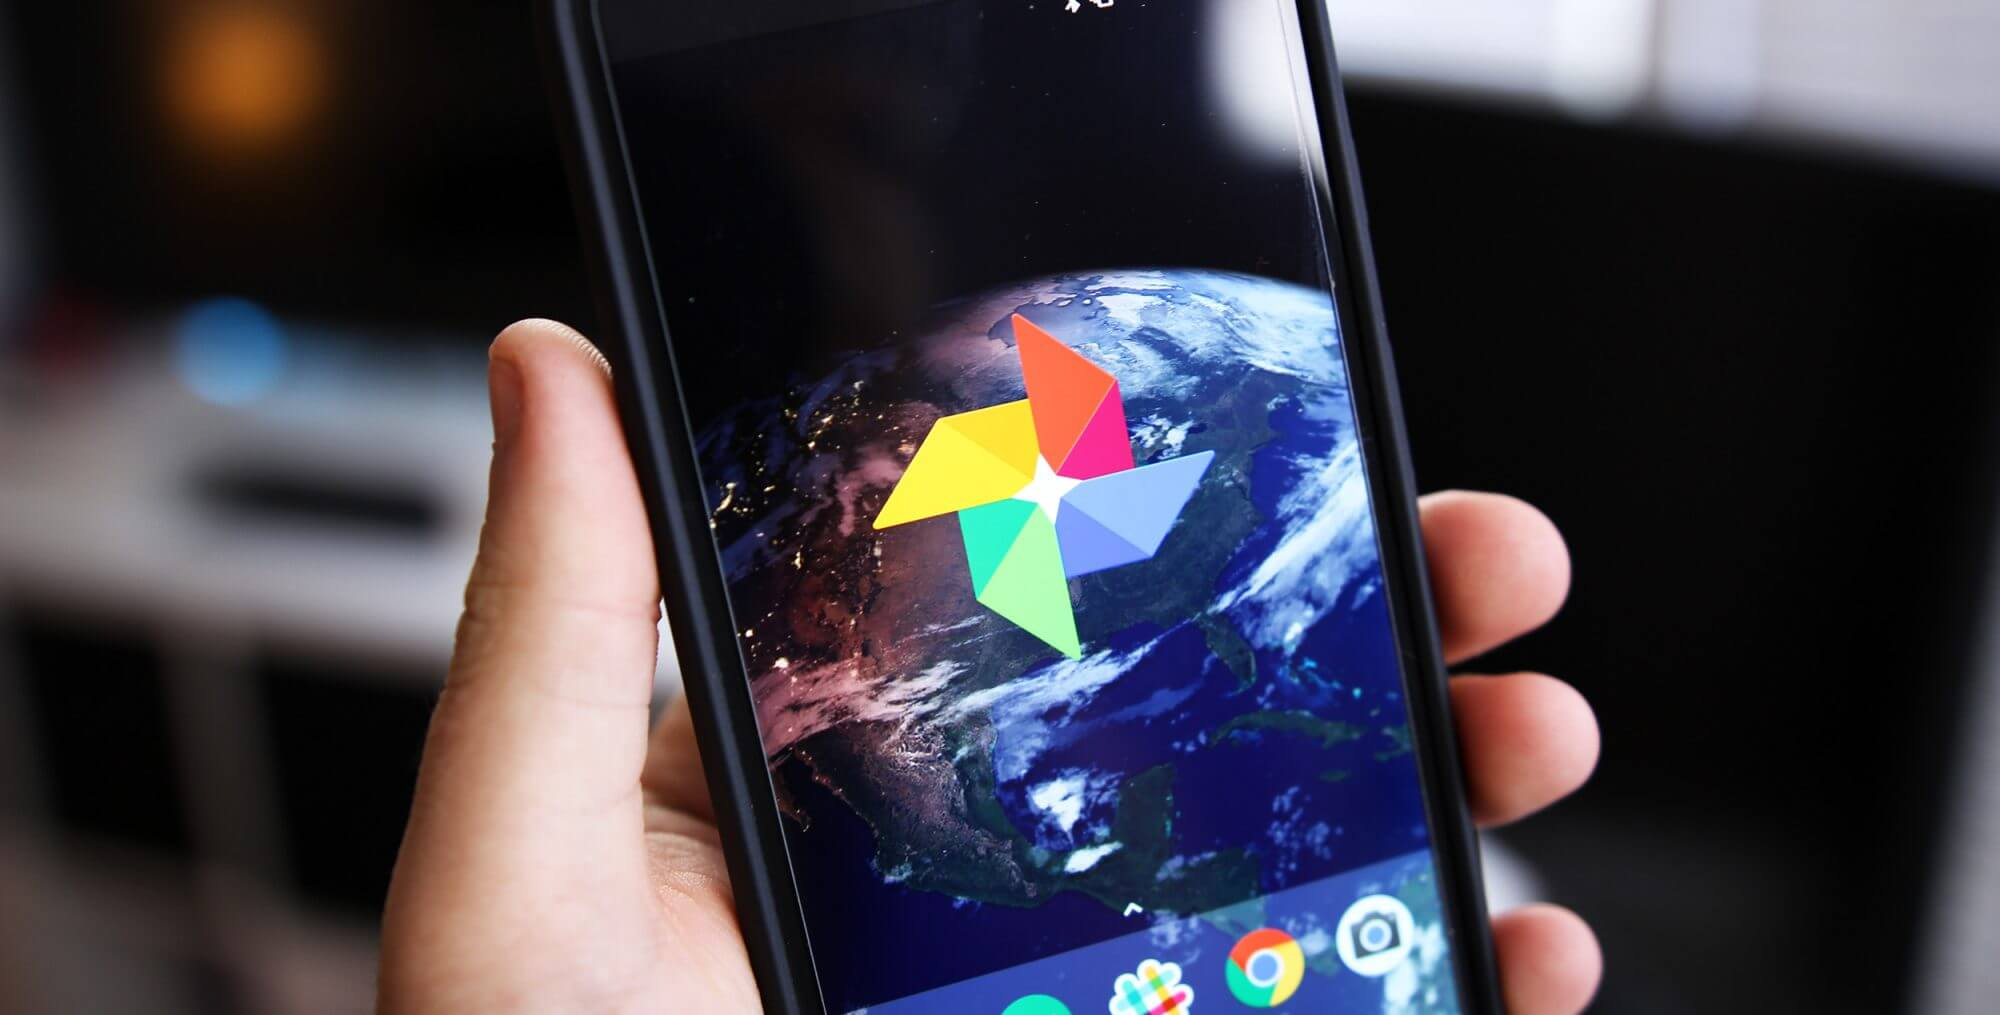 googlephotos android